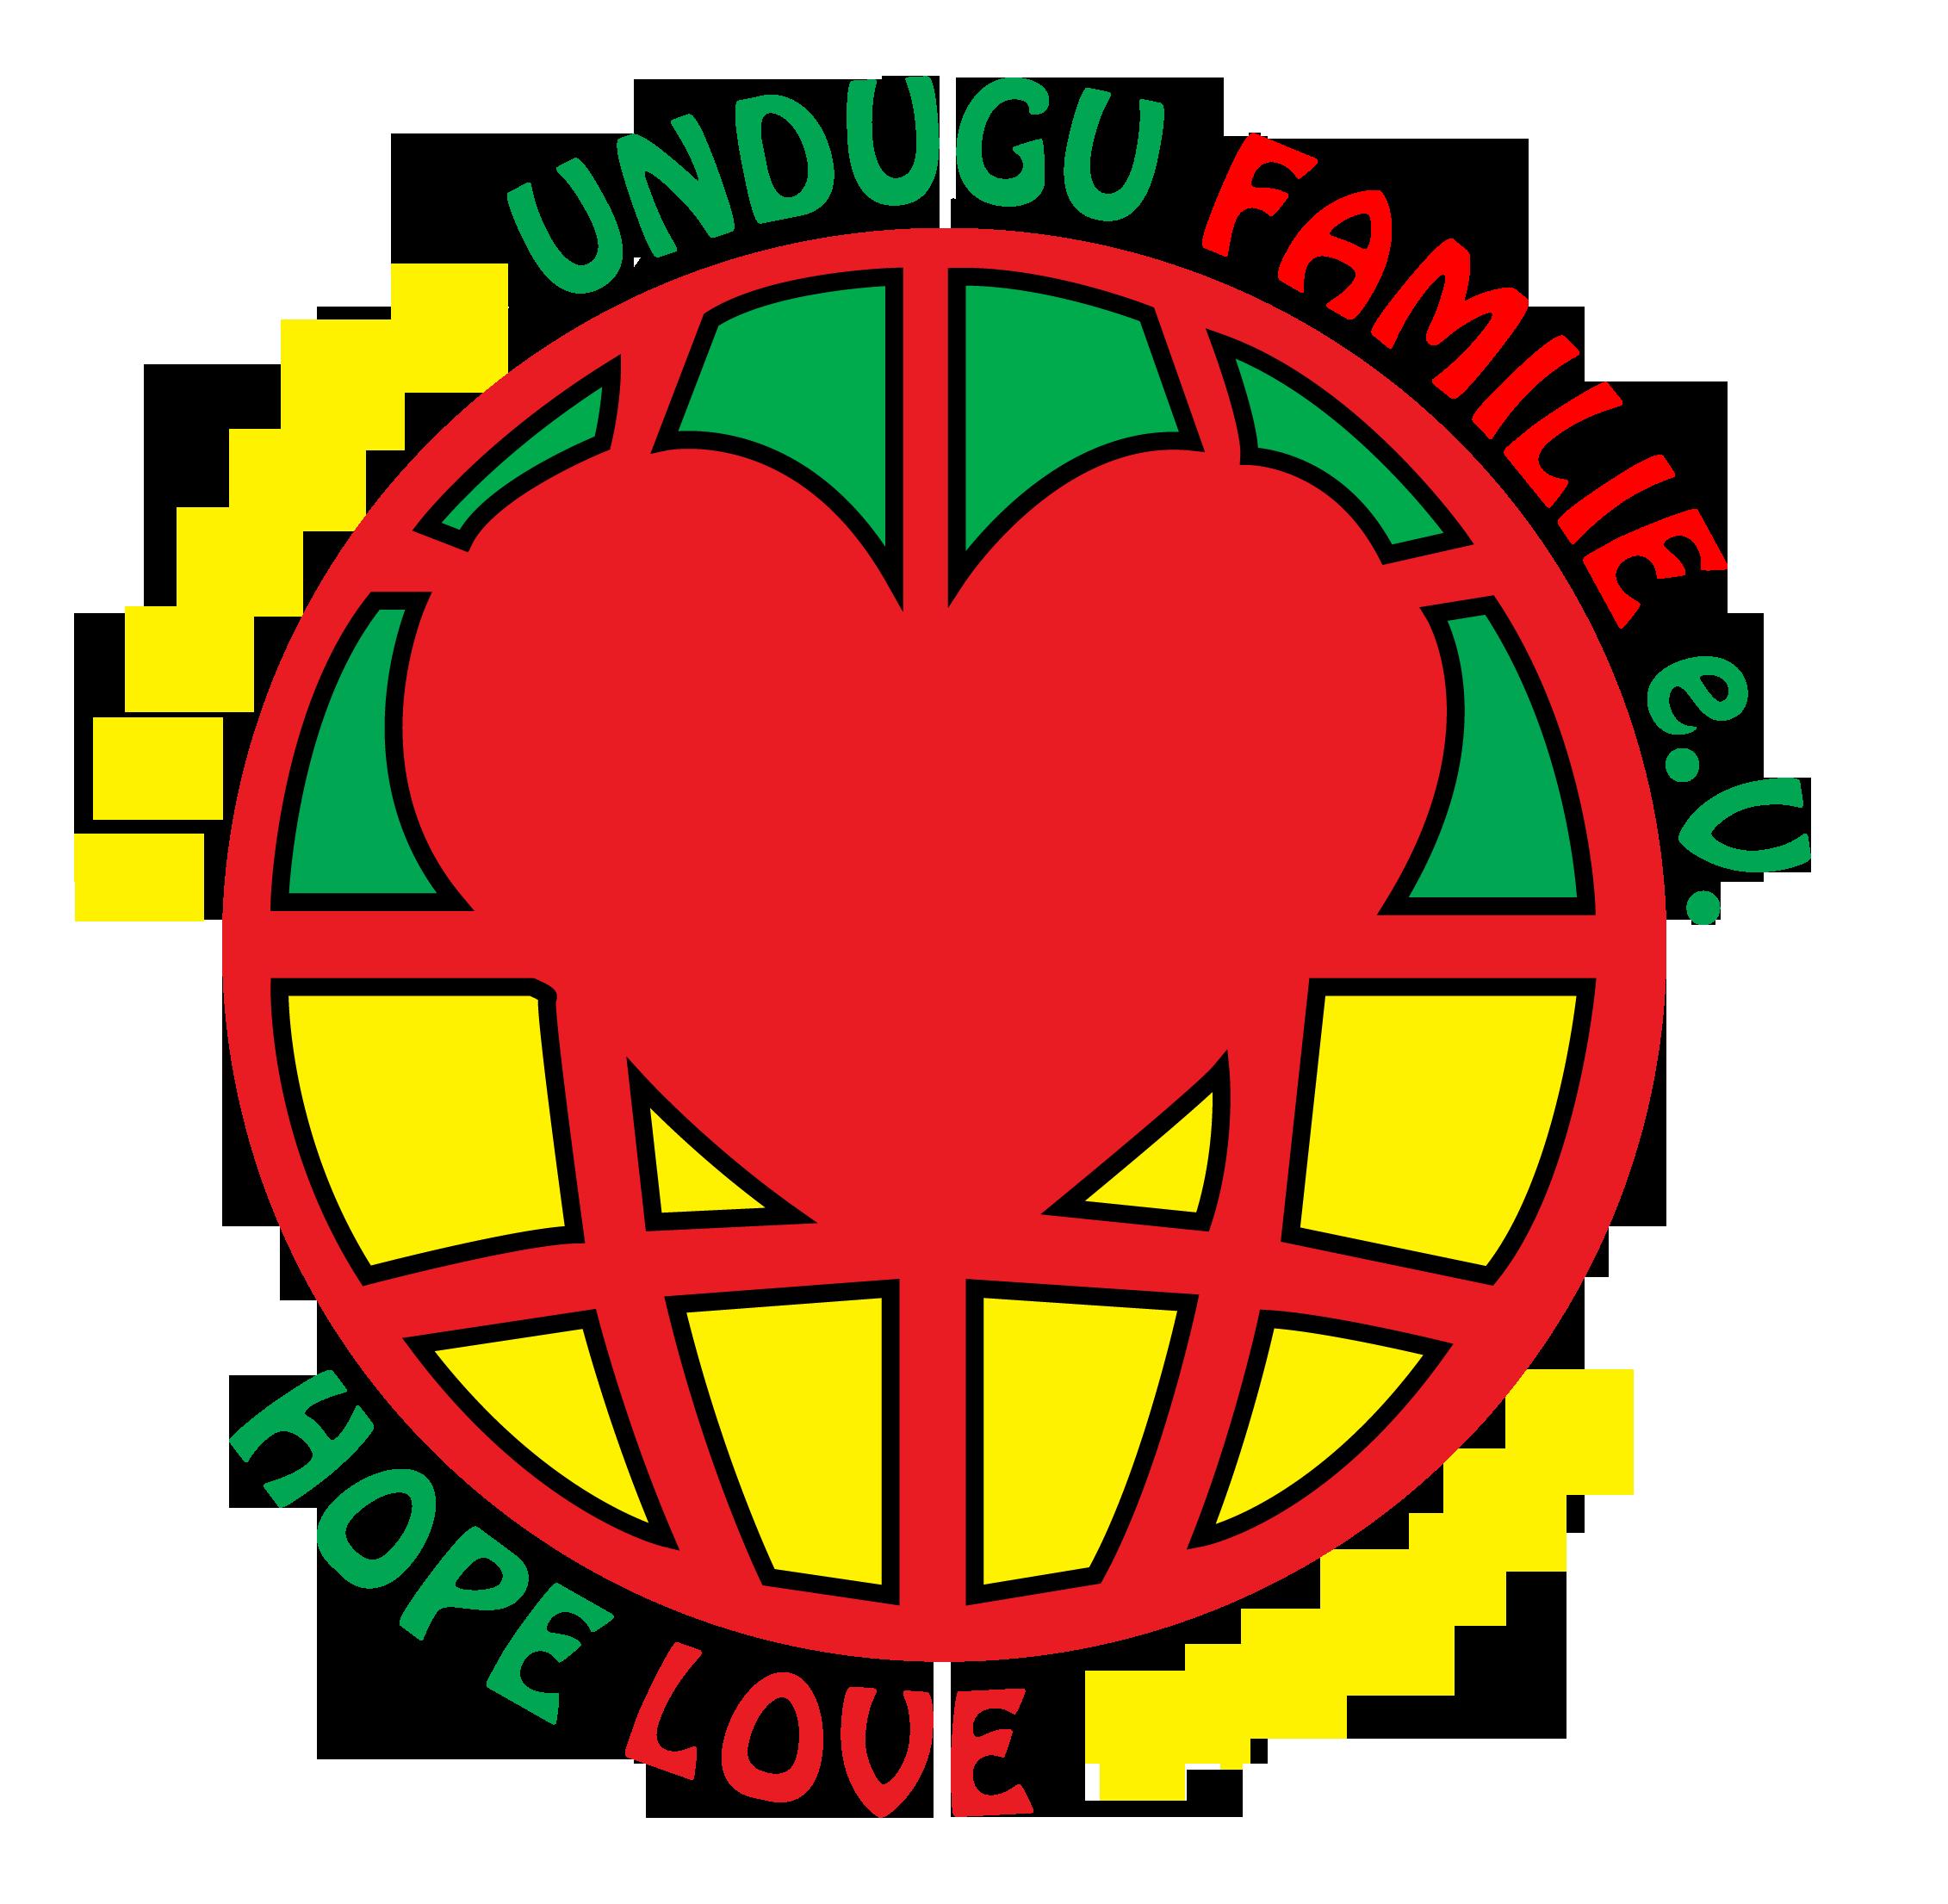 Sosolya Undugu Familie e.V.